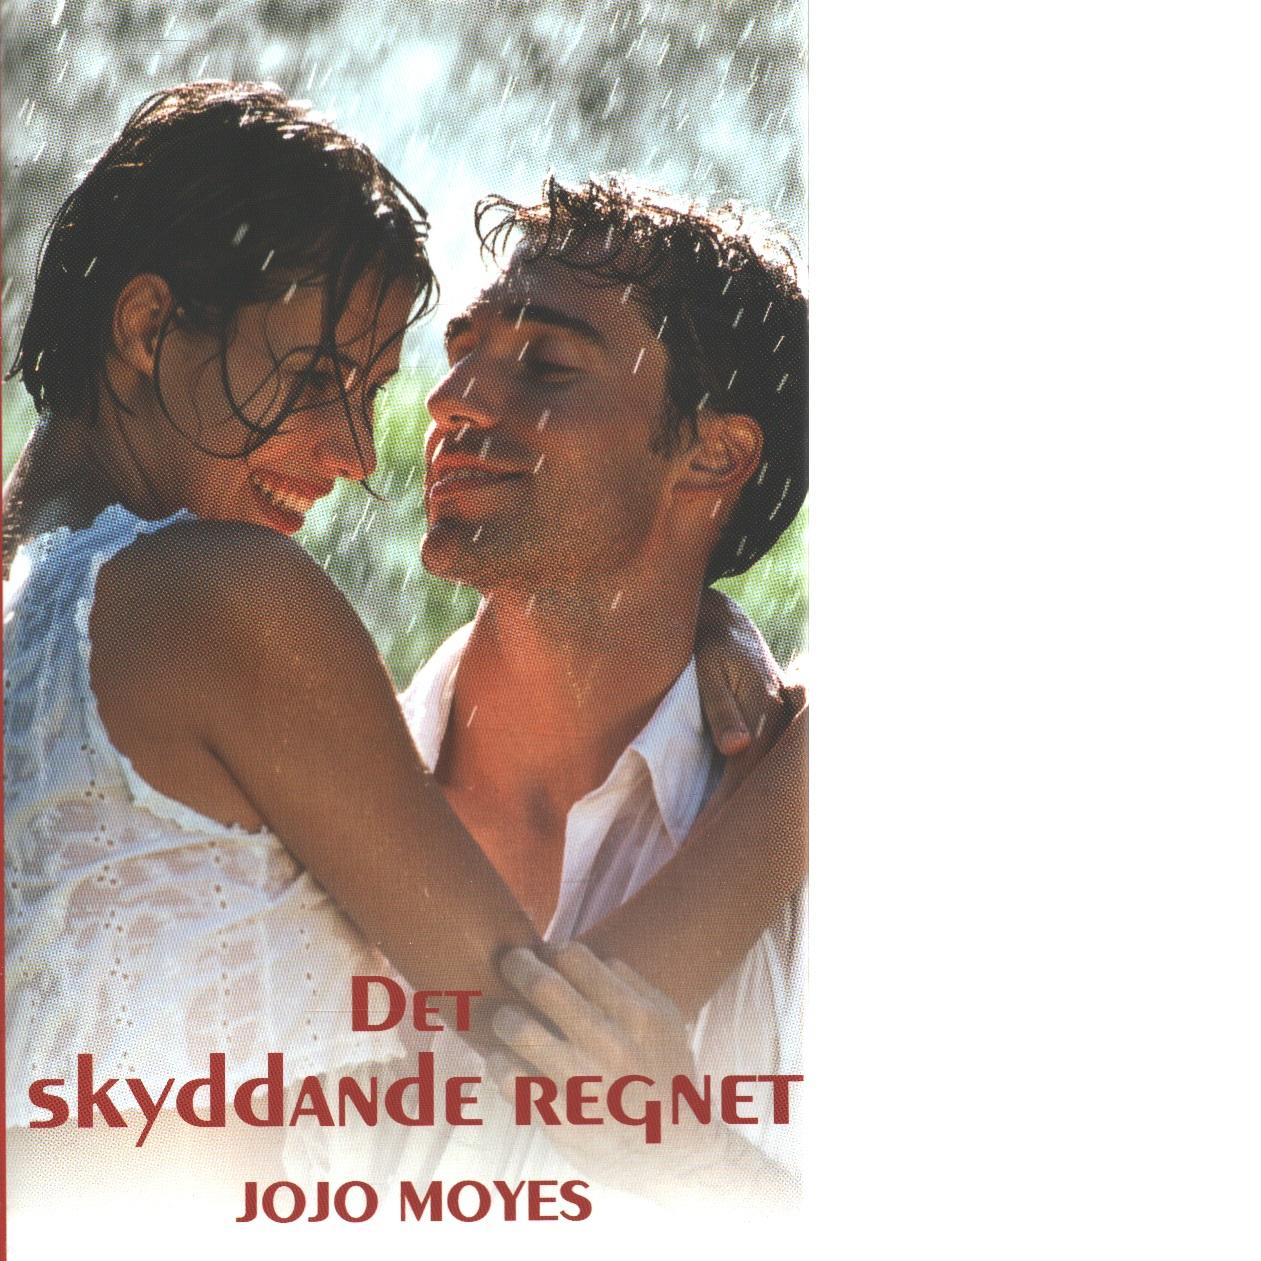 Det skyddande regnet - Moyes, Jojo